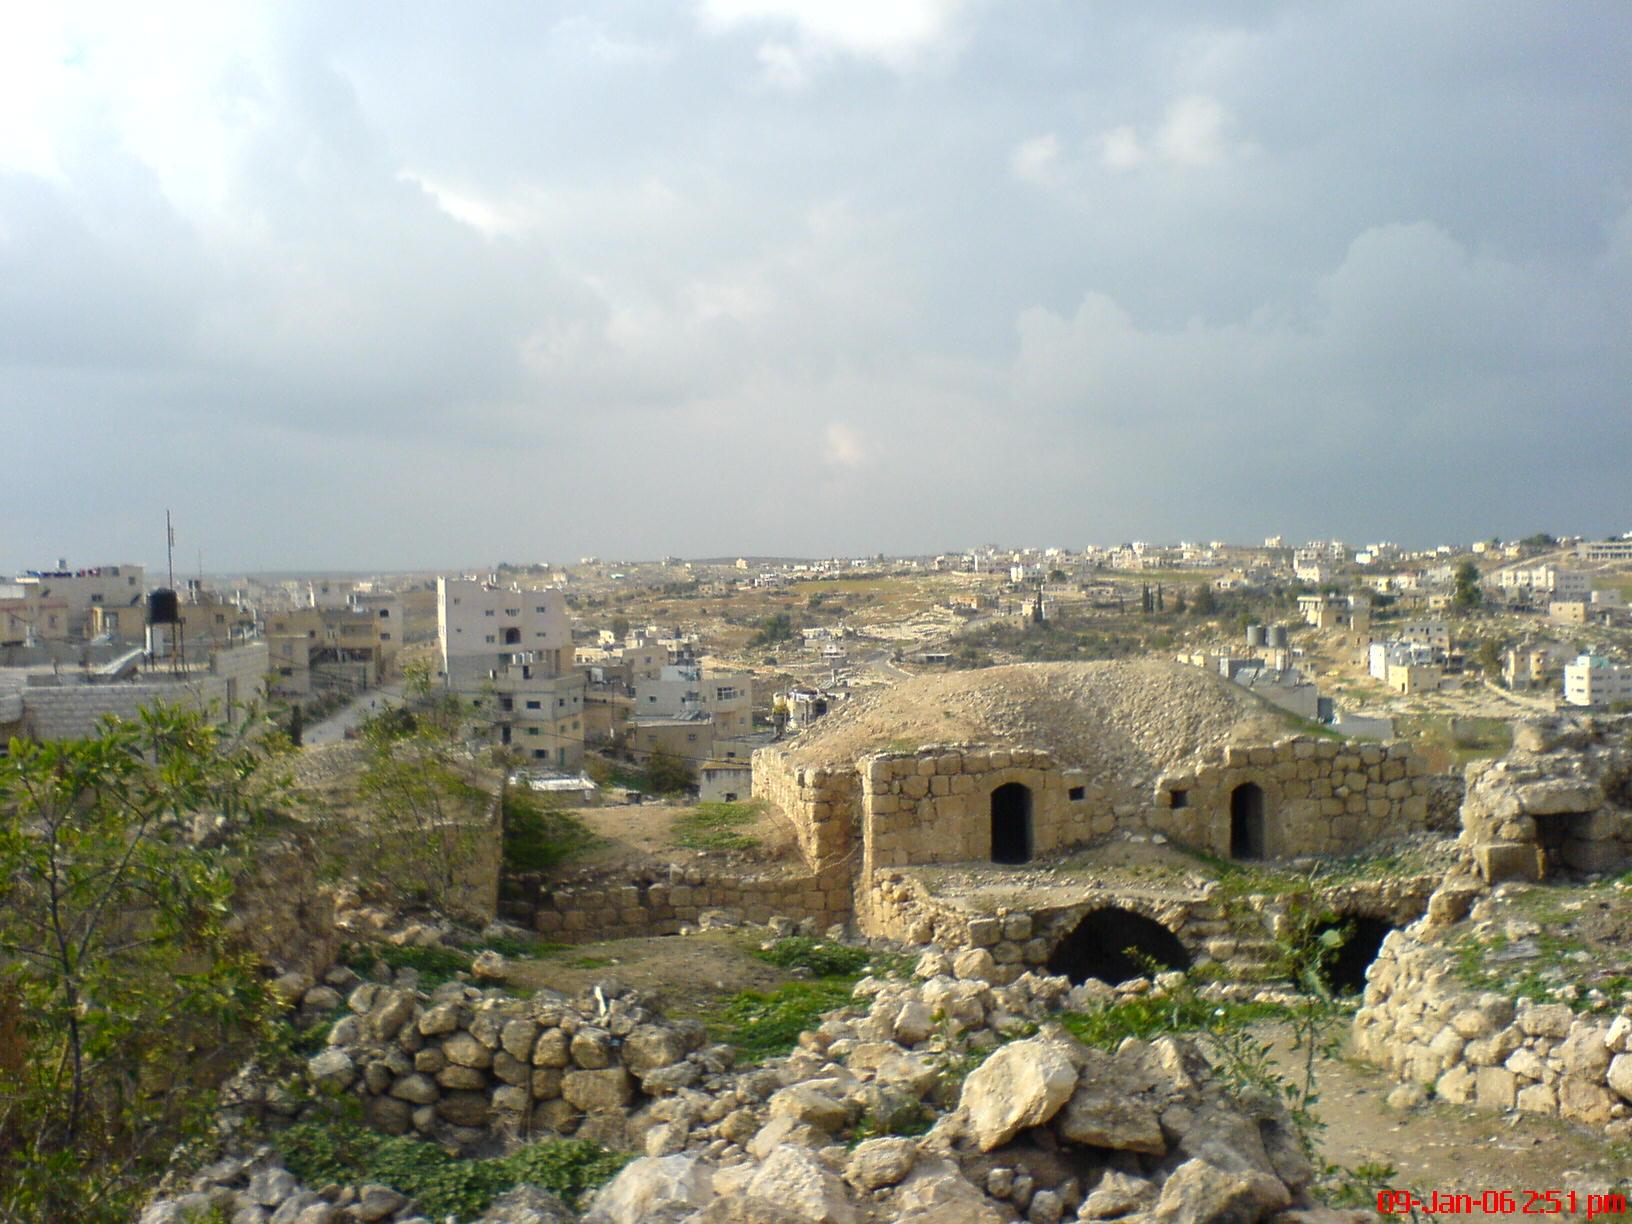 http://www.palestineremembered.com/GeoPoints/al_Dhahiriya_988/al_Dhahiriya-13697.jpg